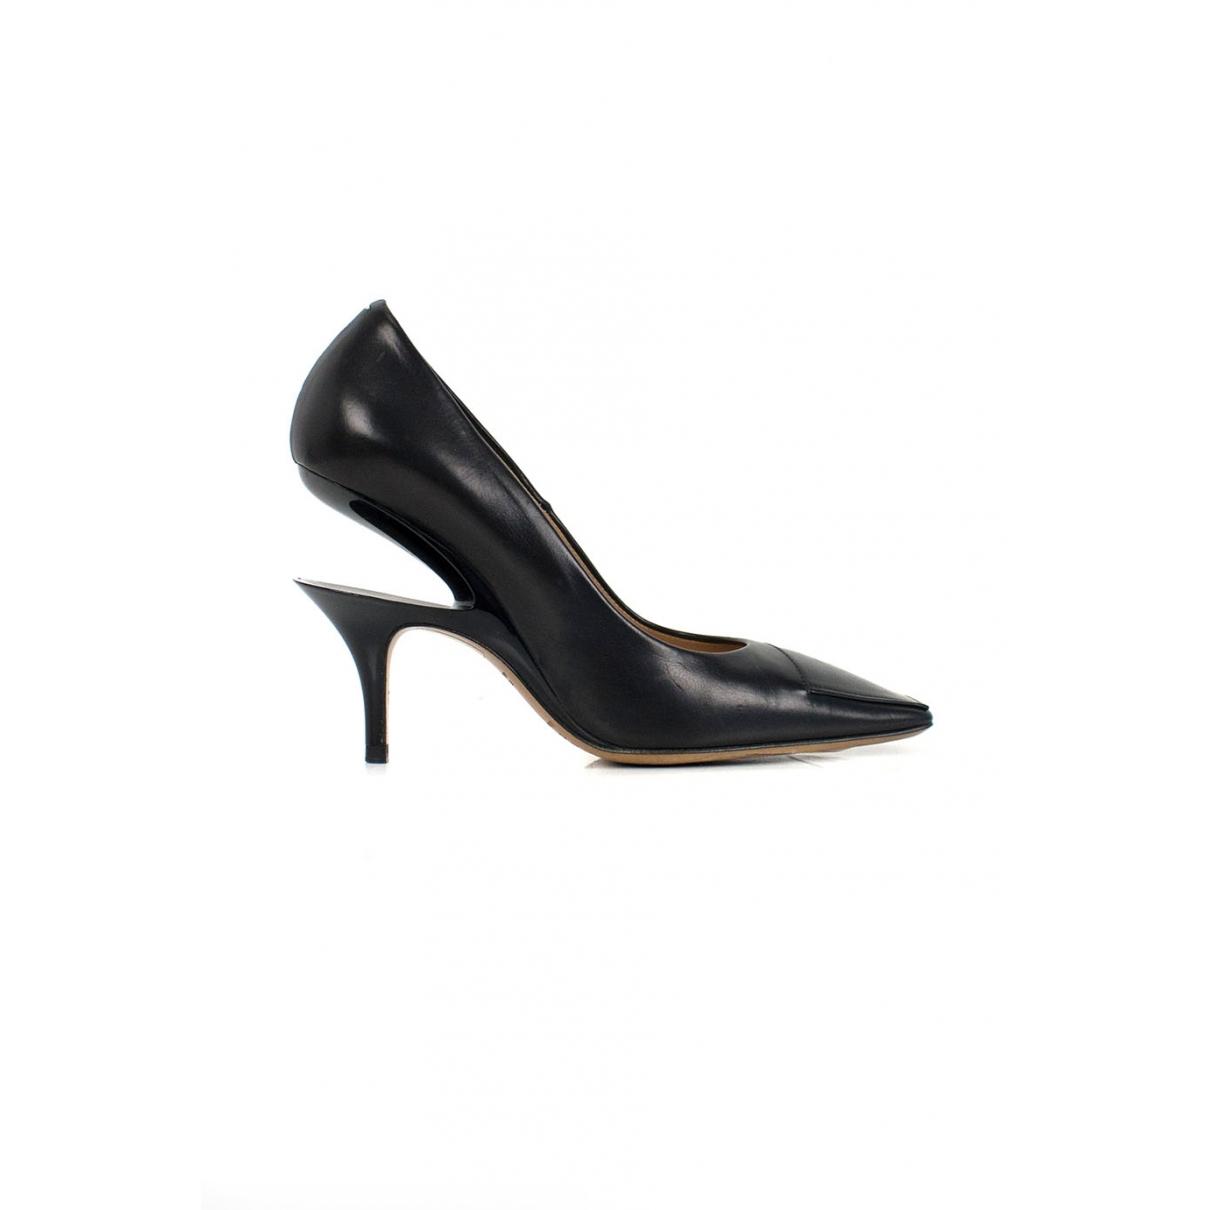 Maison Martin Margiela \N Black Leather Heels for Women 35 EU